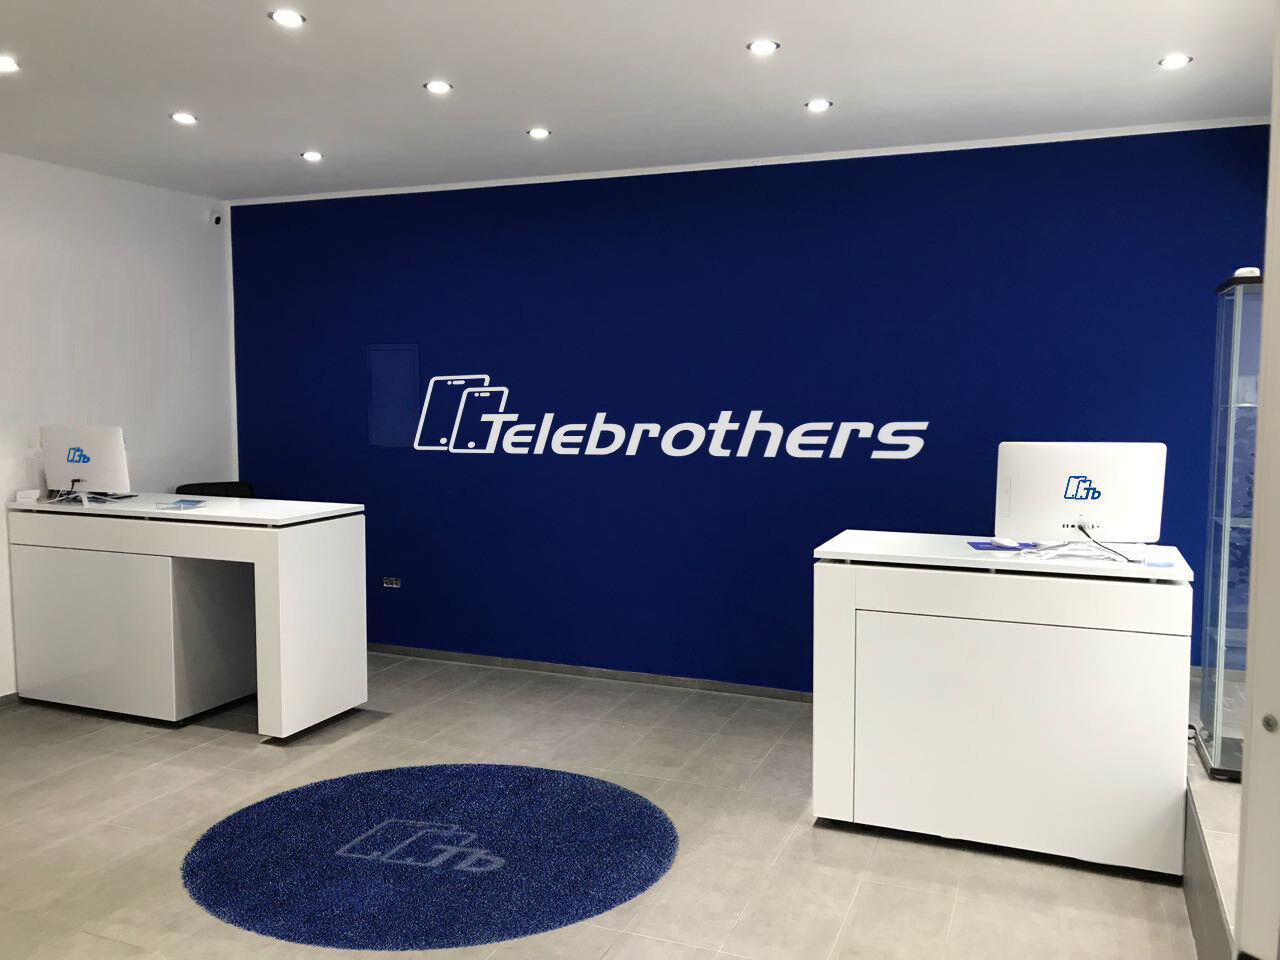 Telebrothers